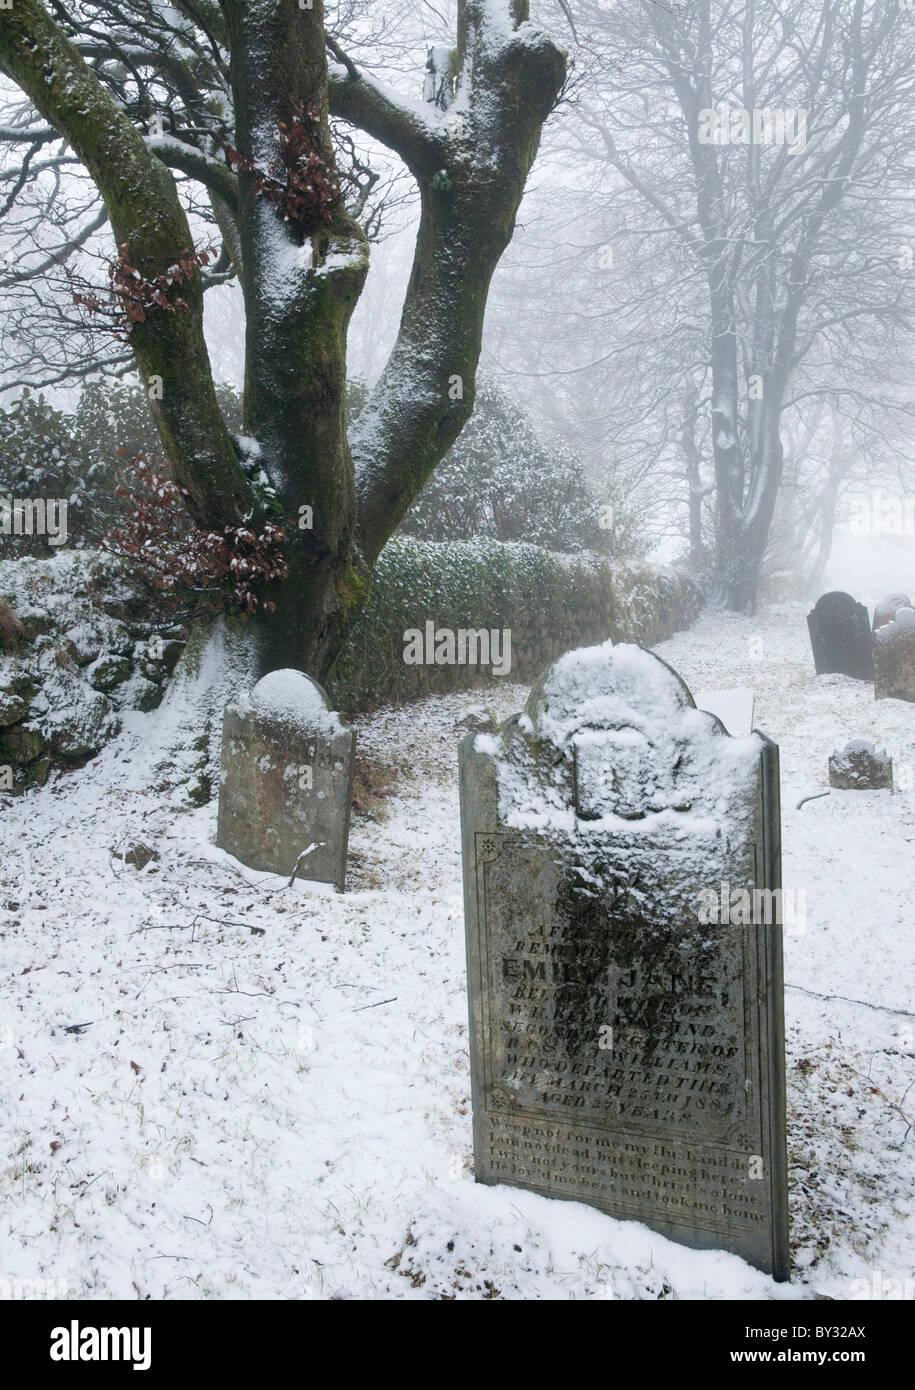 Headstones in Princetown church covered in snow, Dartmoor, Devon UK - Stock Image